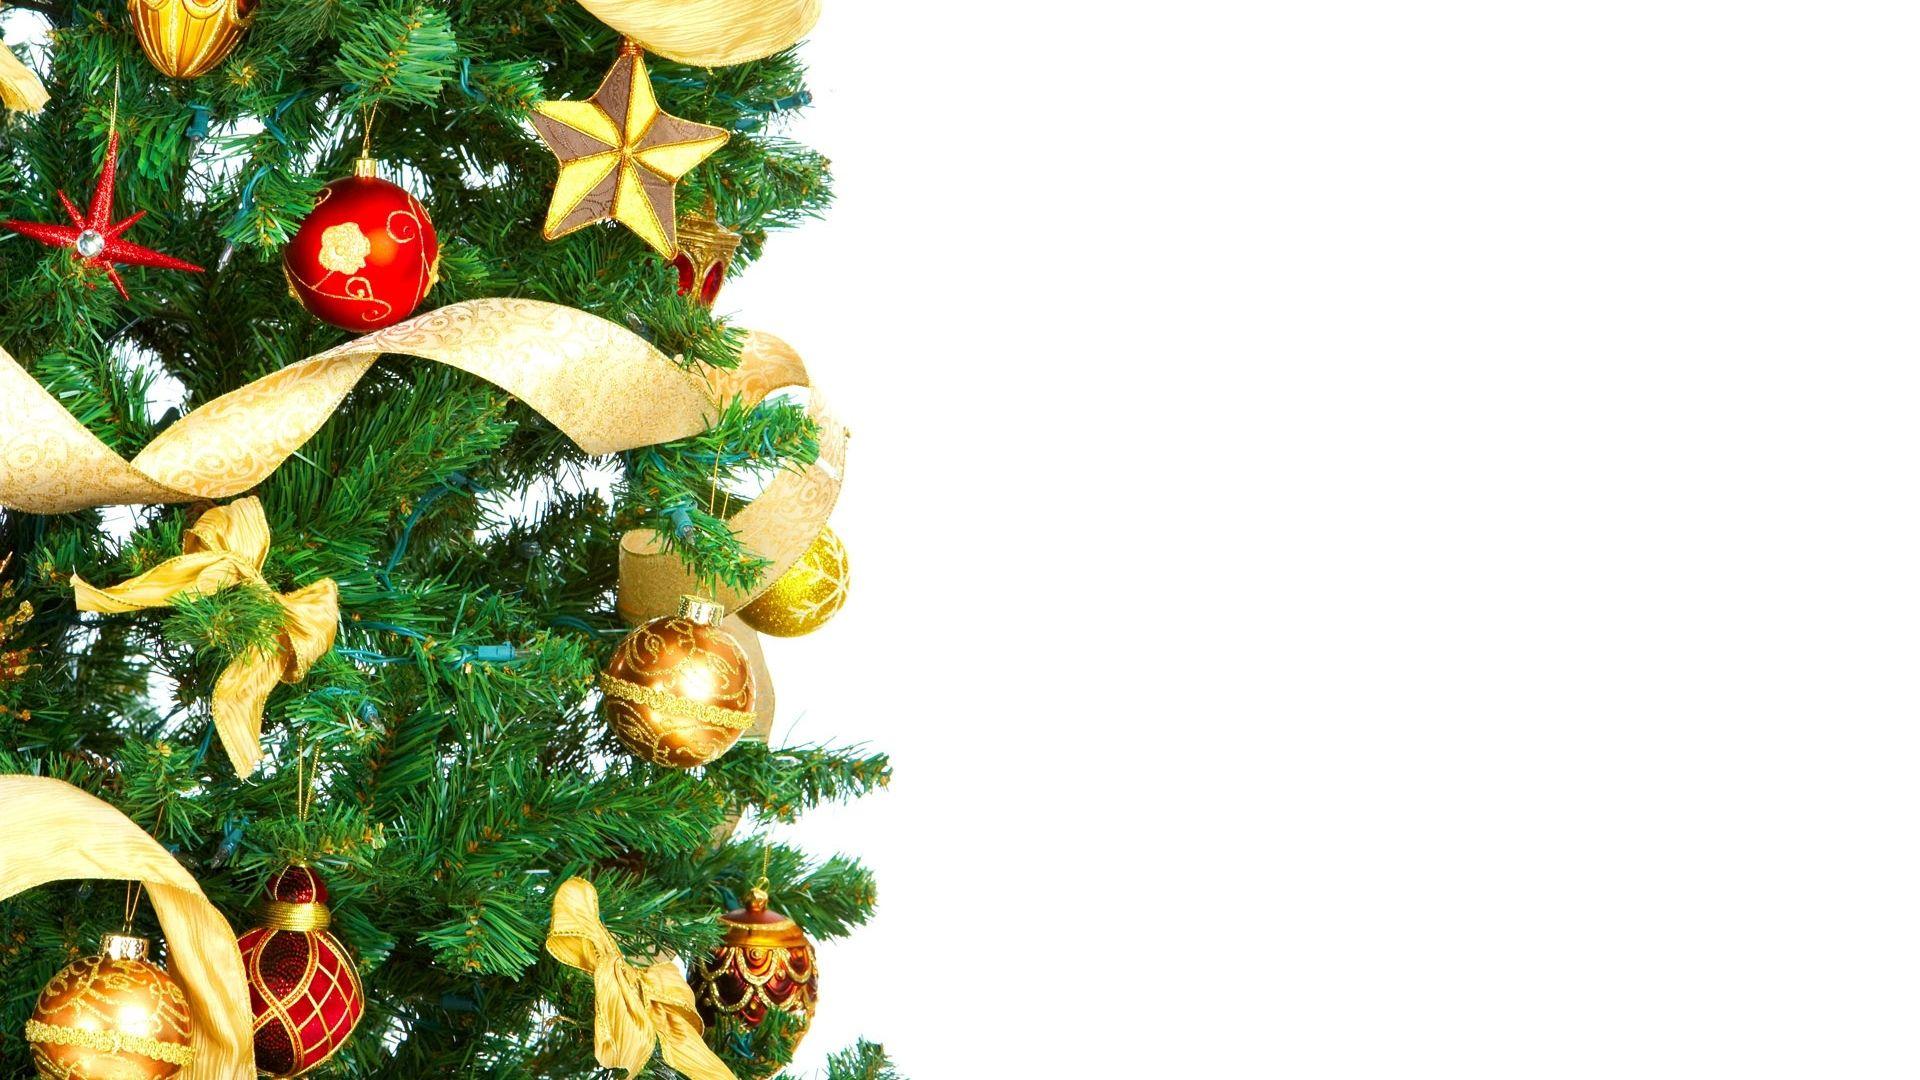 Good Wallpaper High Resolution Christmas - 7d519c80cd5dbac7647ec4791d2ada23  Perfect Image Reference_16732.jpg